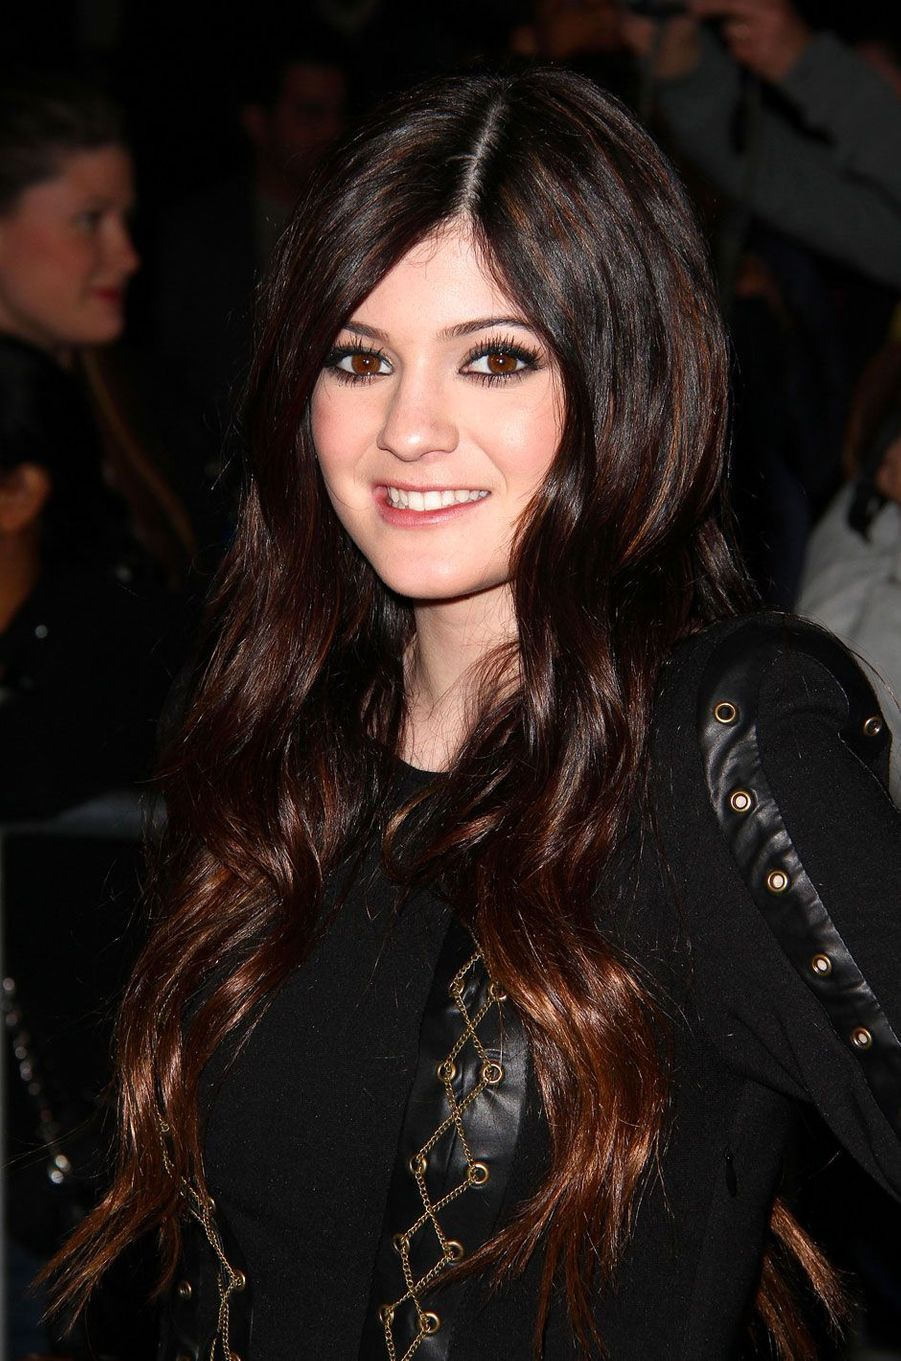 Kylie Jenner en 2011